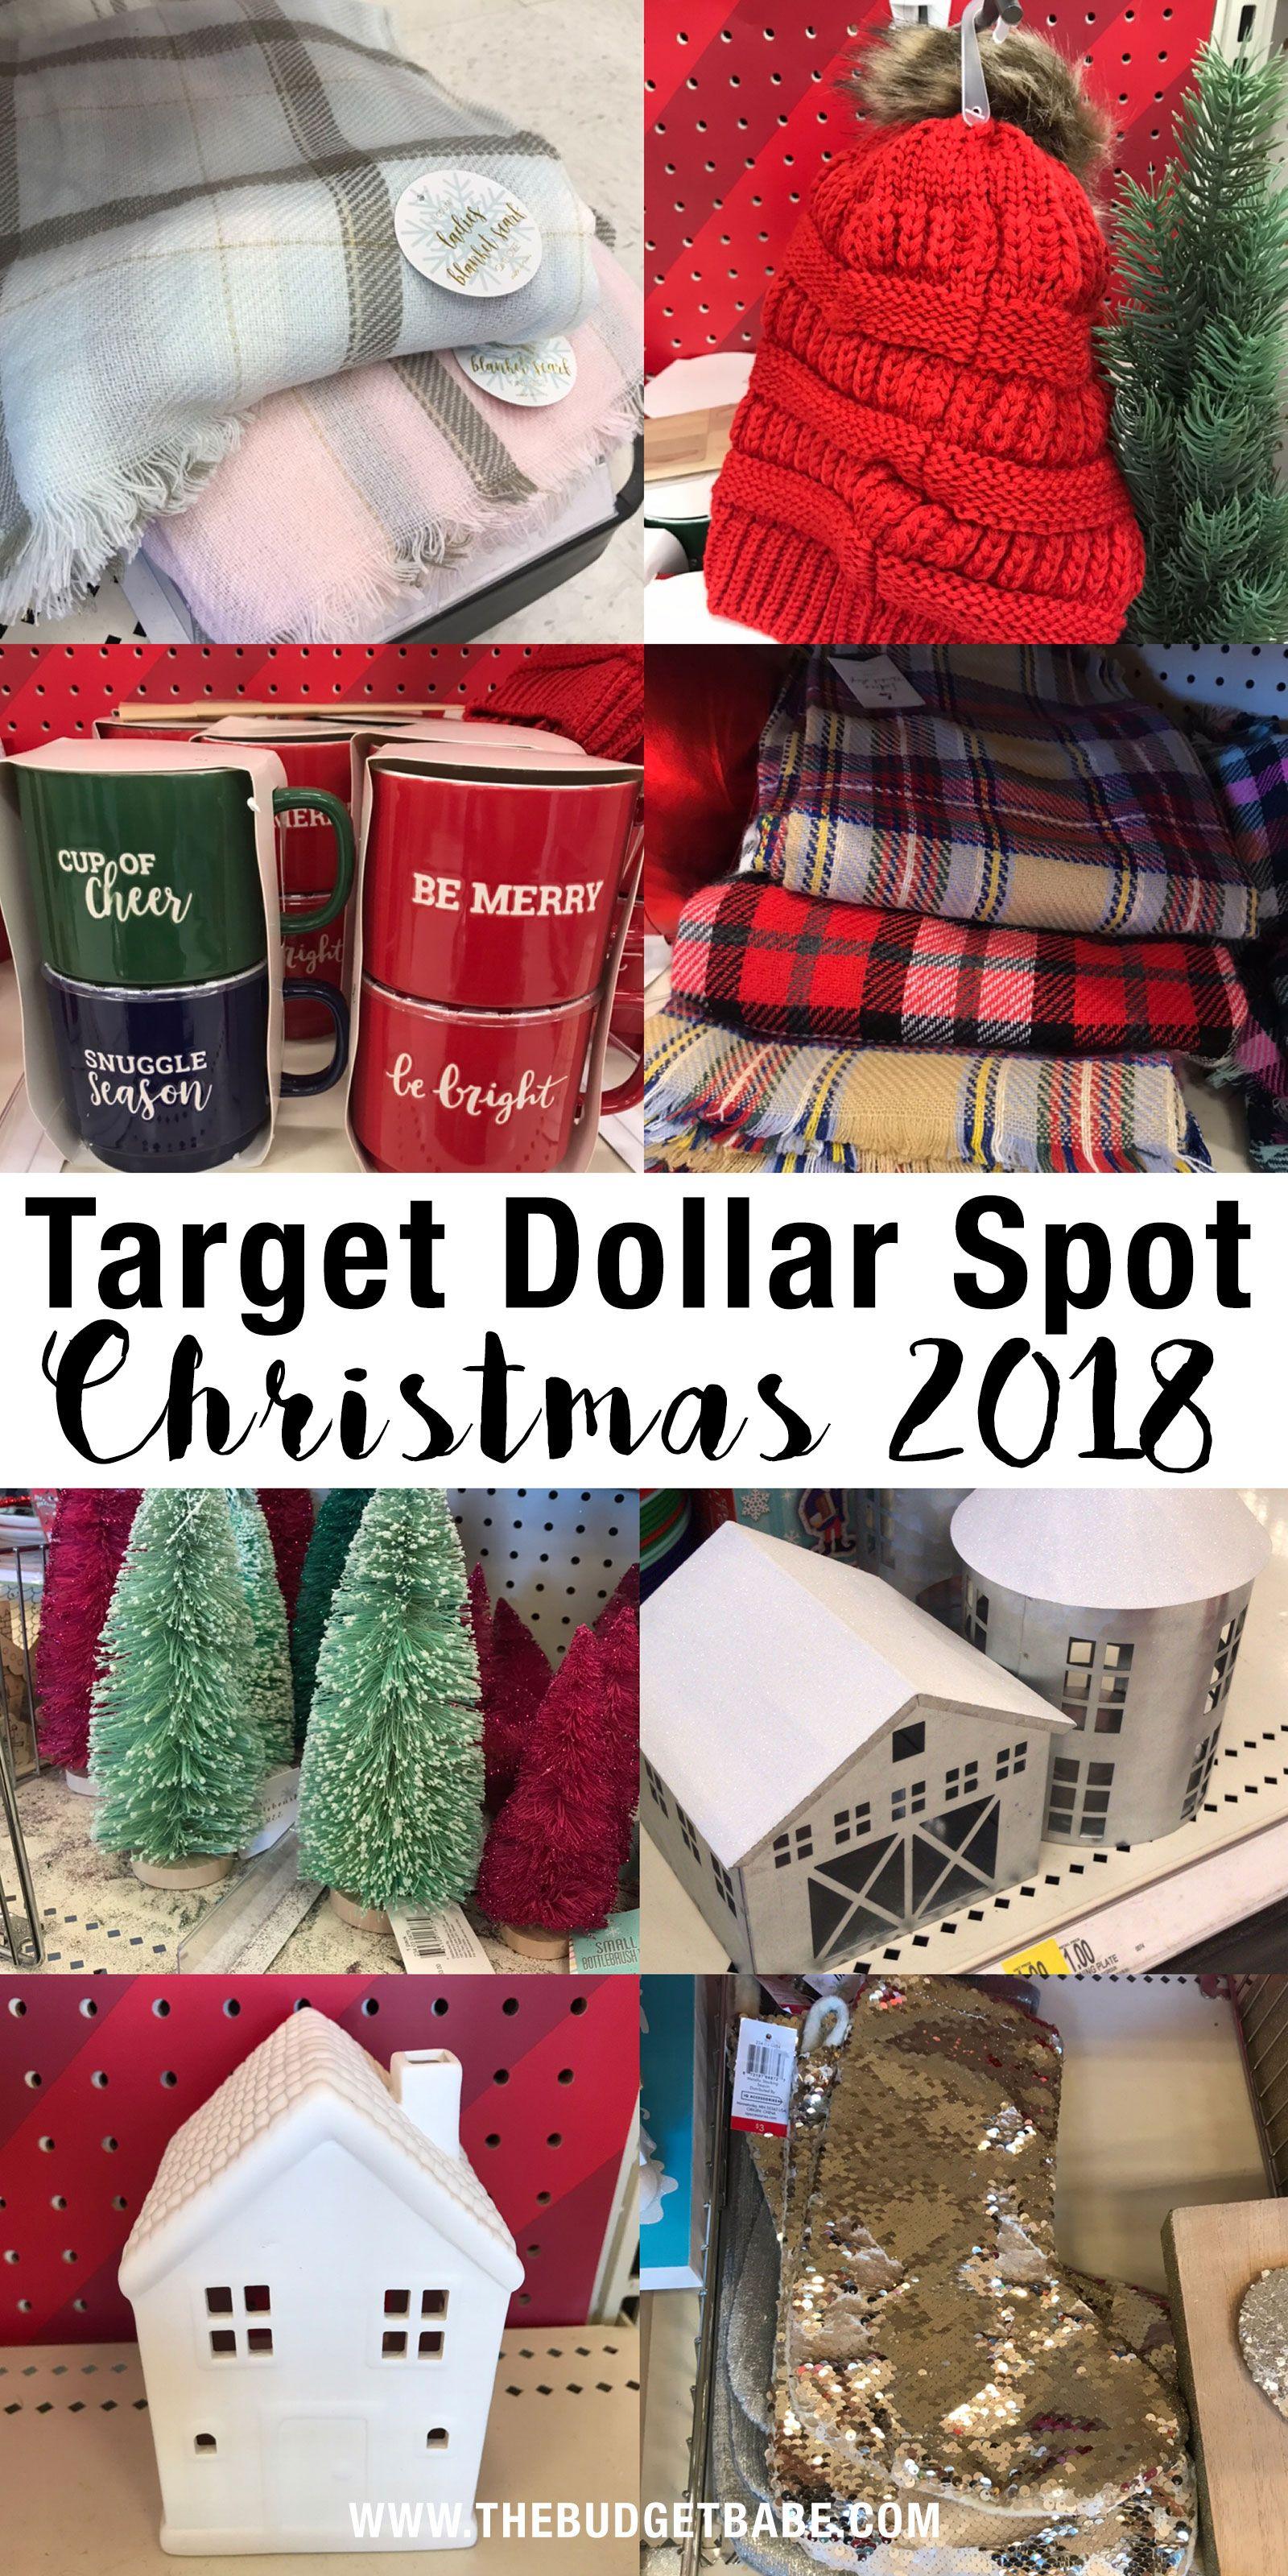 Christmas 2018 At The Target Dollar Spot See 40 Photos Target Christmas Target Dollar Spot Christmas